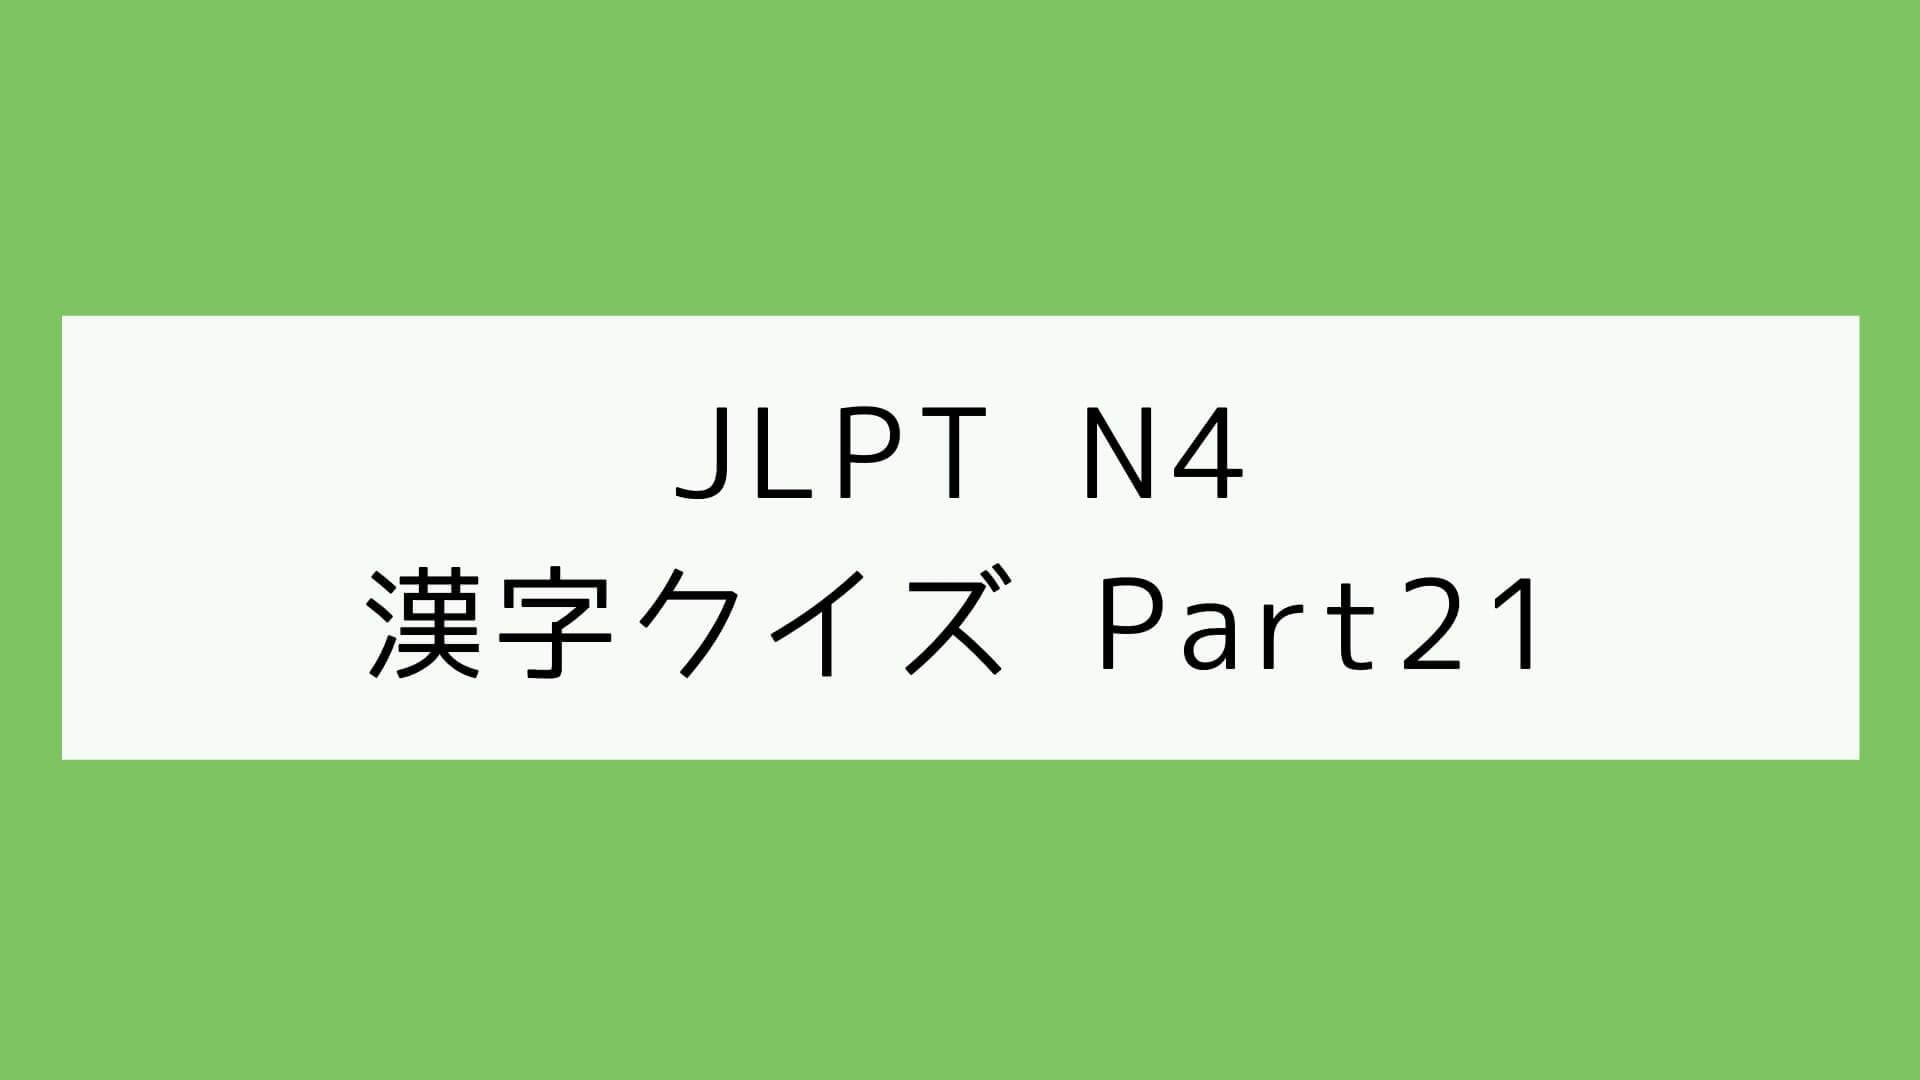 【JLPT N4】漢字クイズ Part21